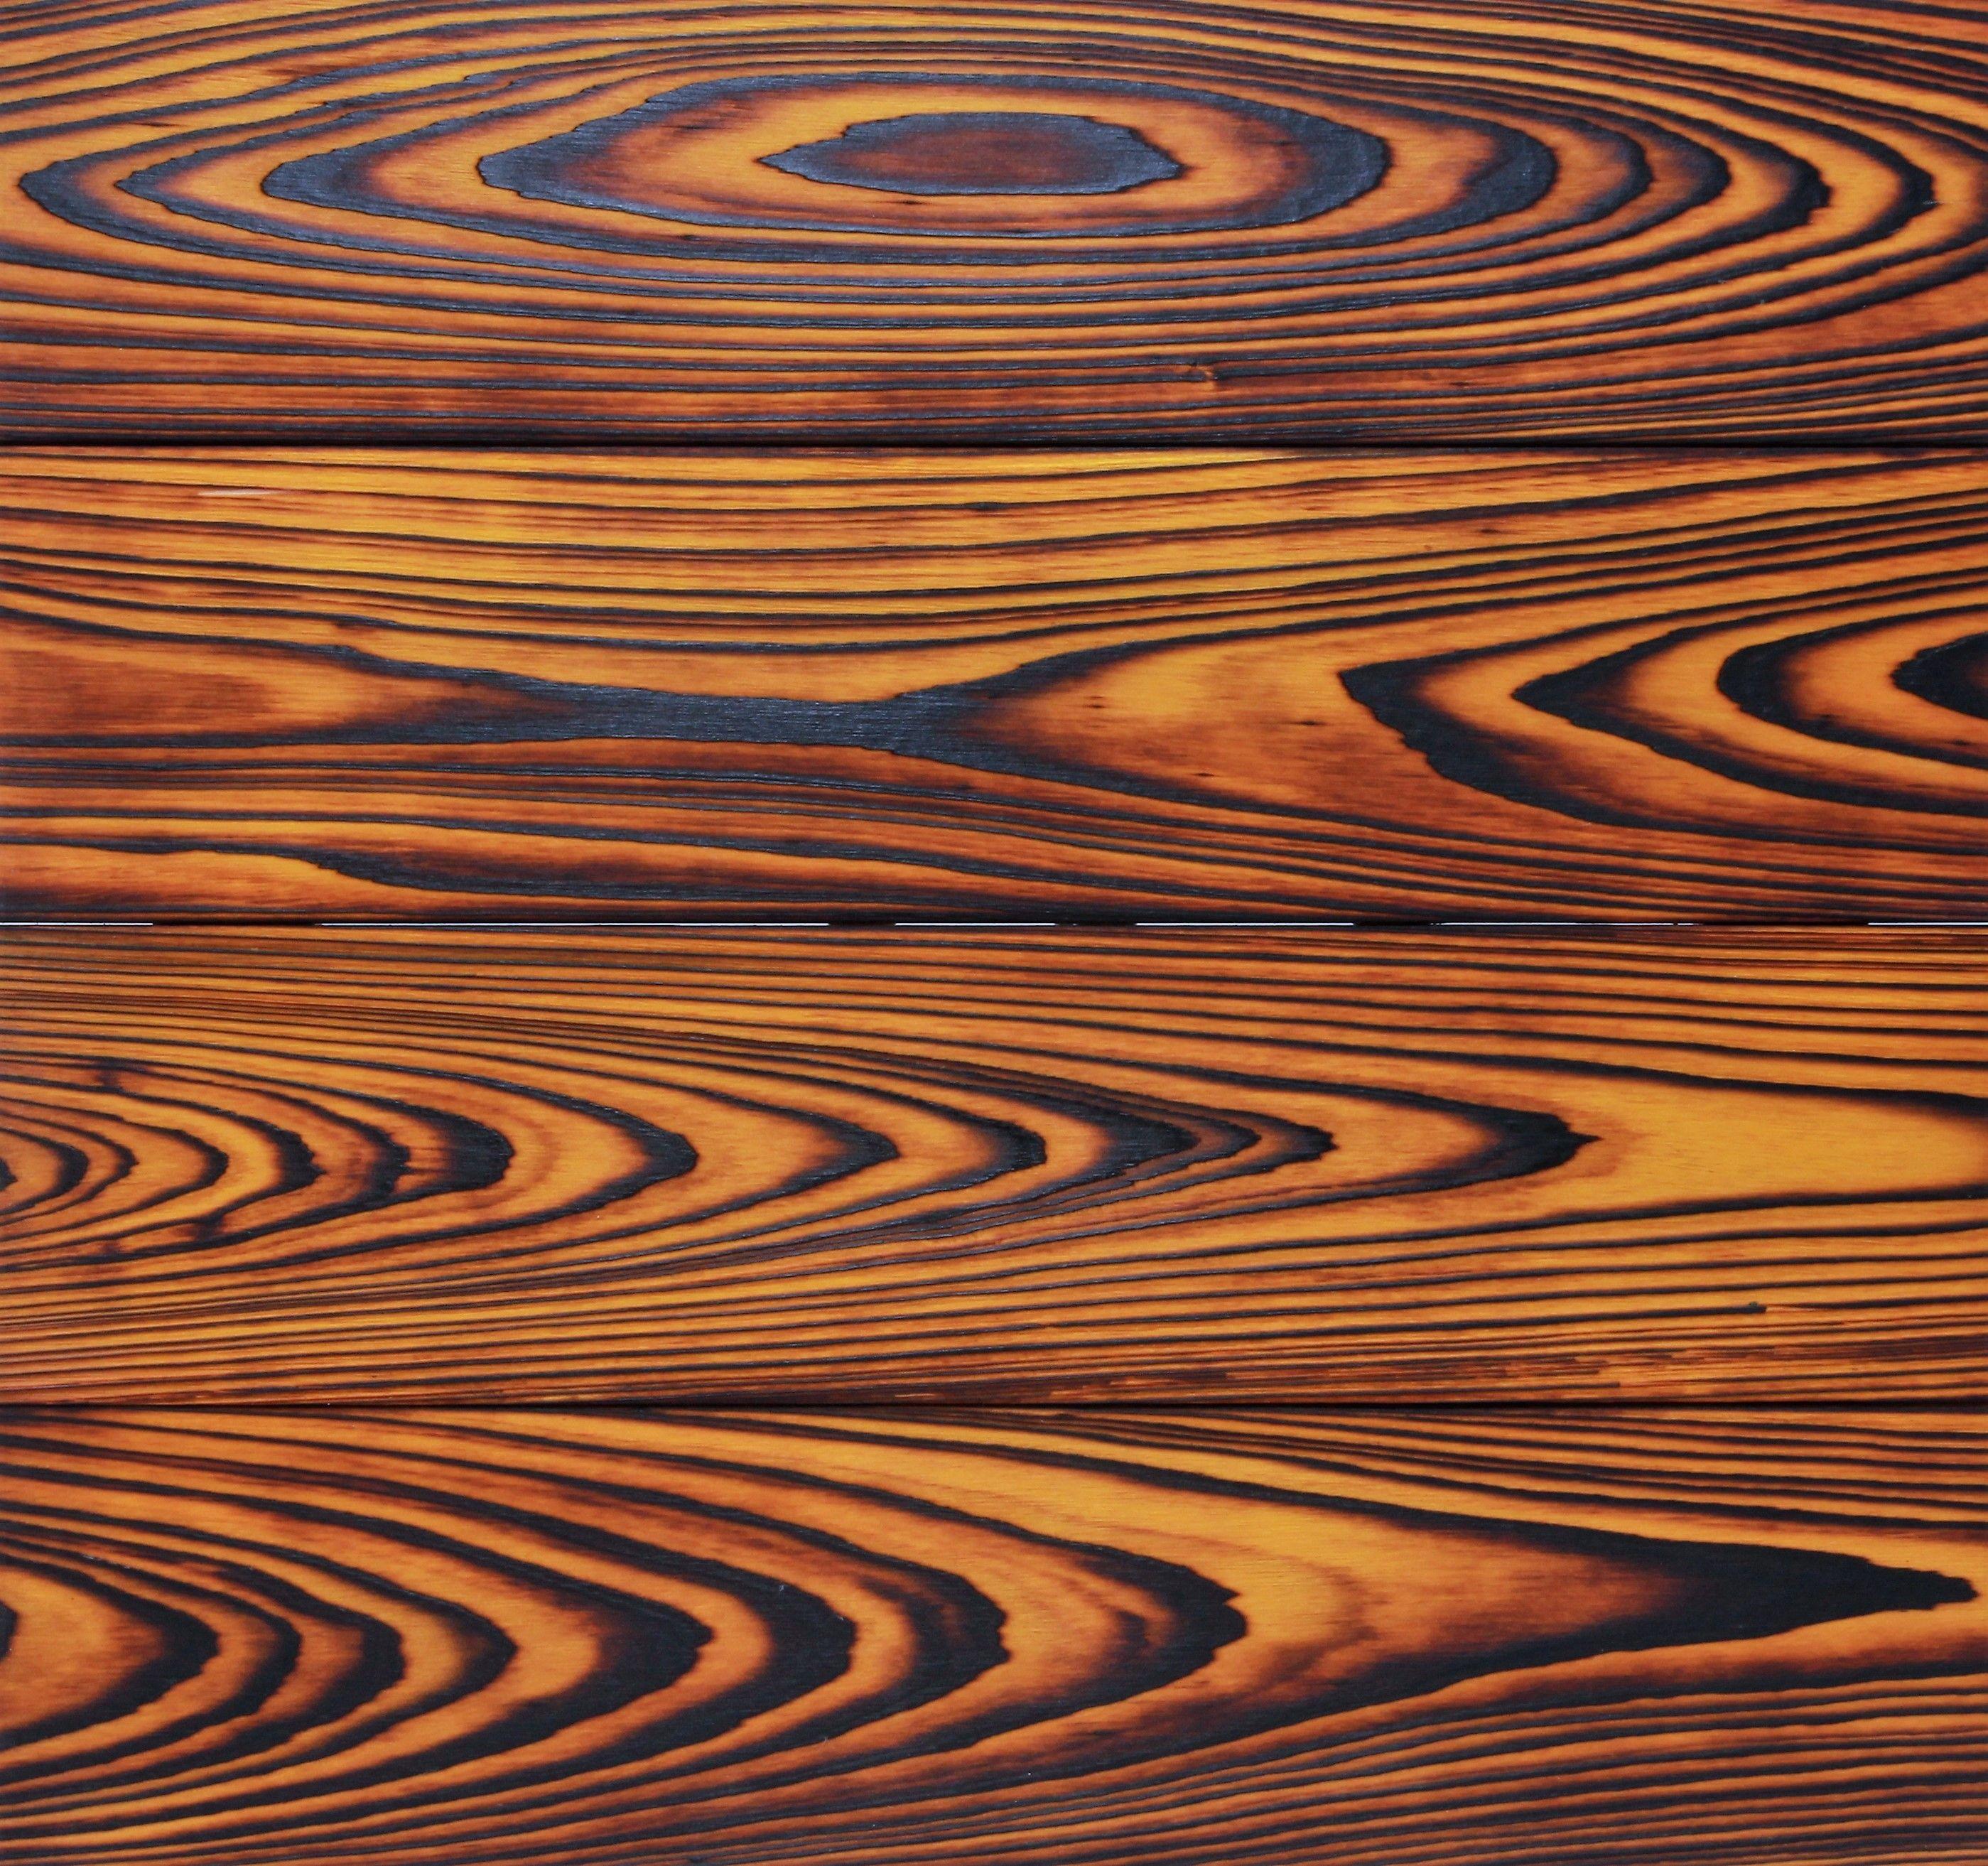 Yellow Shou Sugi Ban Charred Wood Cypress Is Burned